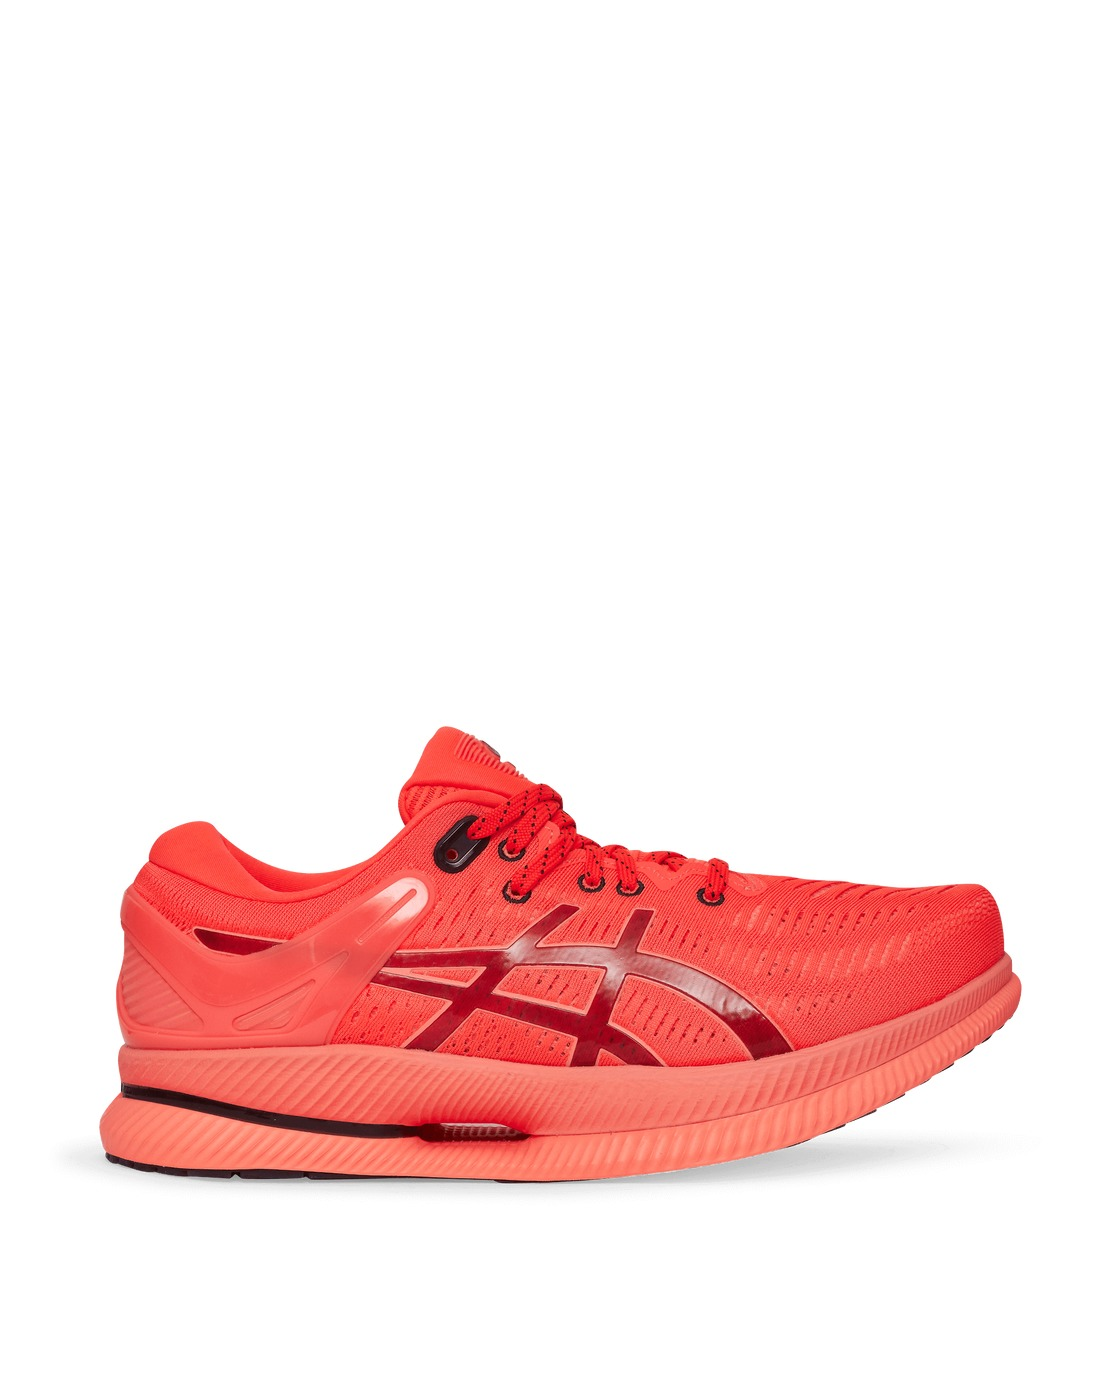 Photo: Asics Metaride Sneakers Sunrise Red/Midnight